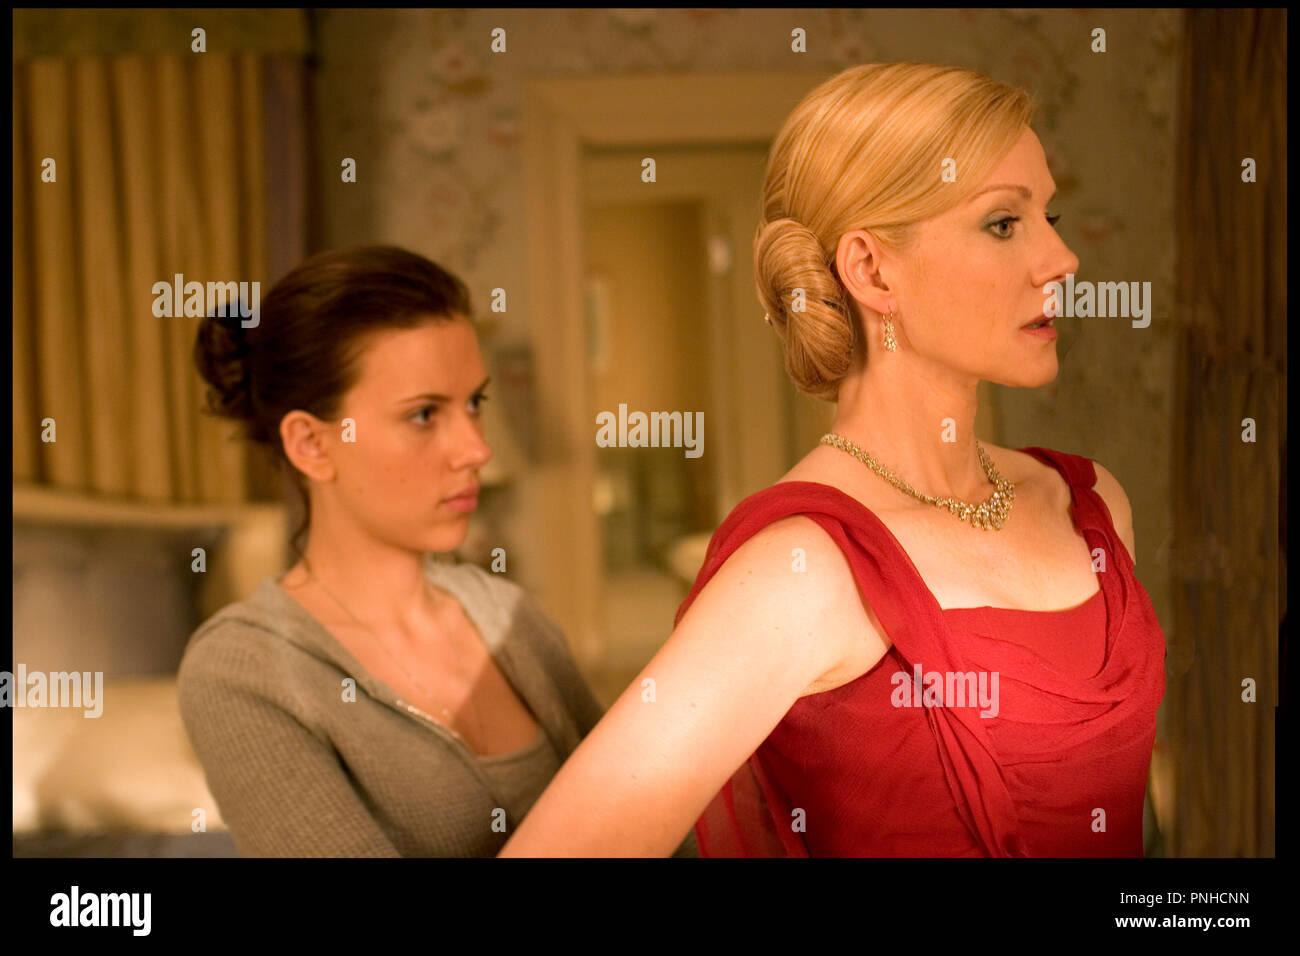 Scarlett Johansson And Laura Linney Stock Photos Images